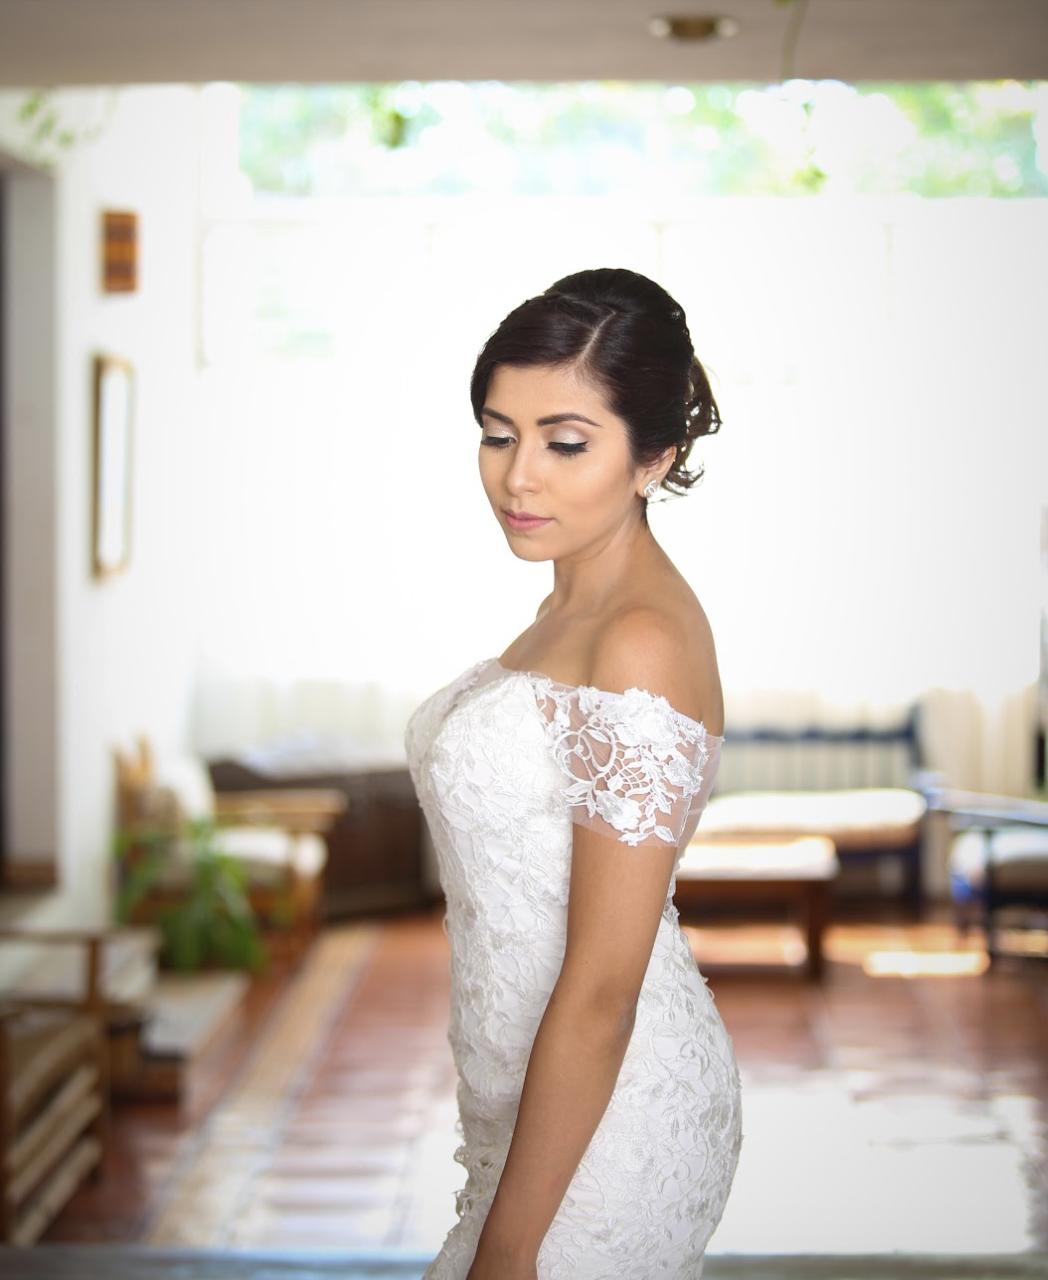 Real Bride: Silvia (Dress: Silvia, off-the-shoulder sleeves, mermaid, tulle skirt)